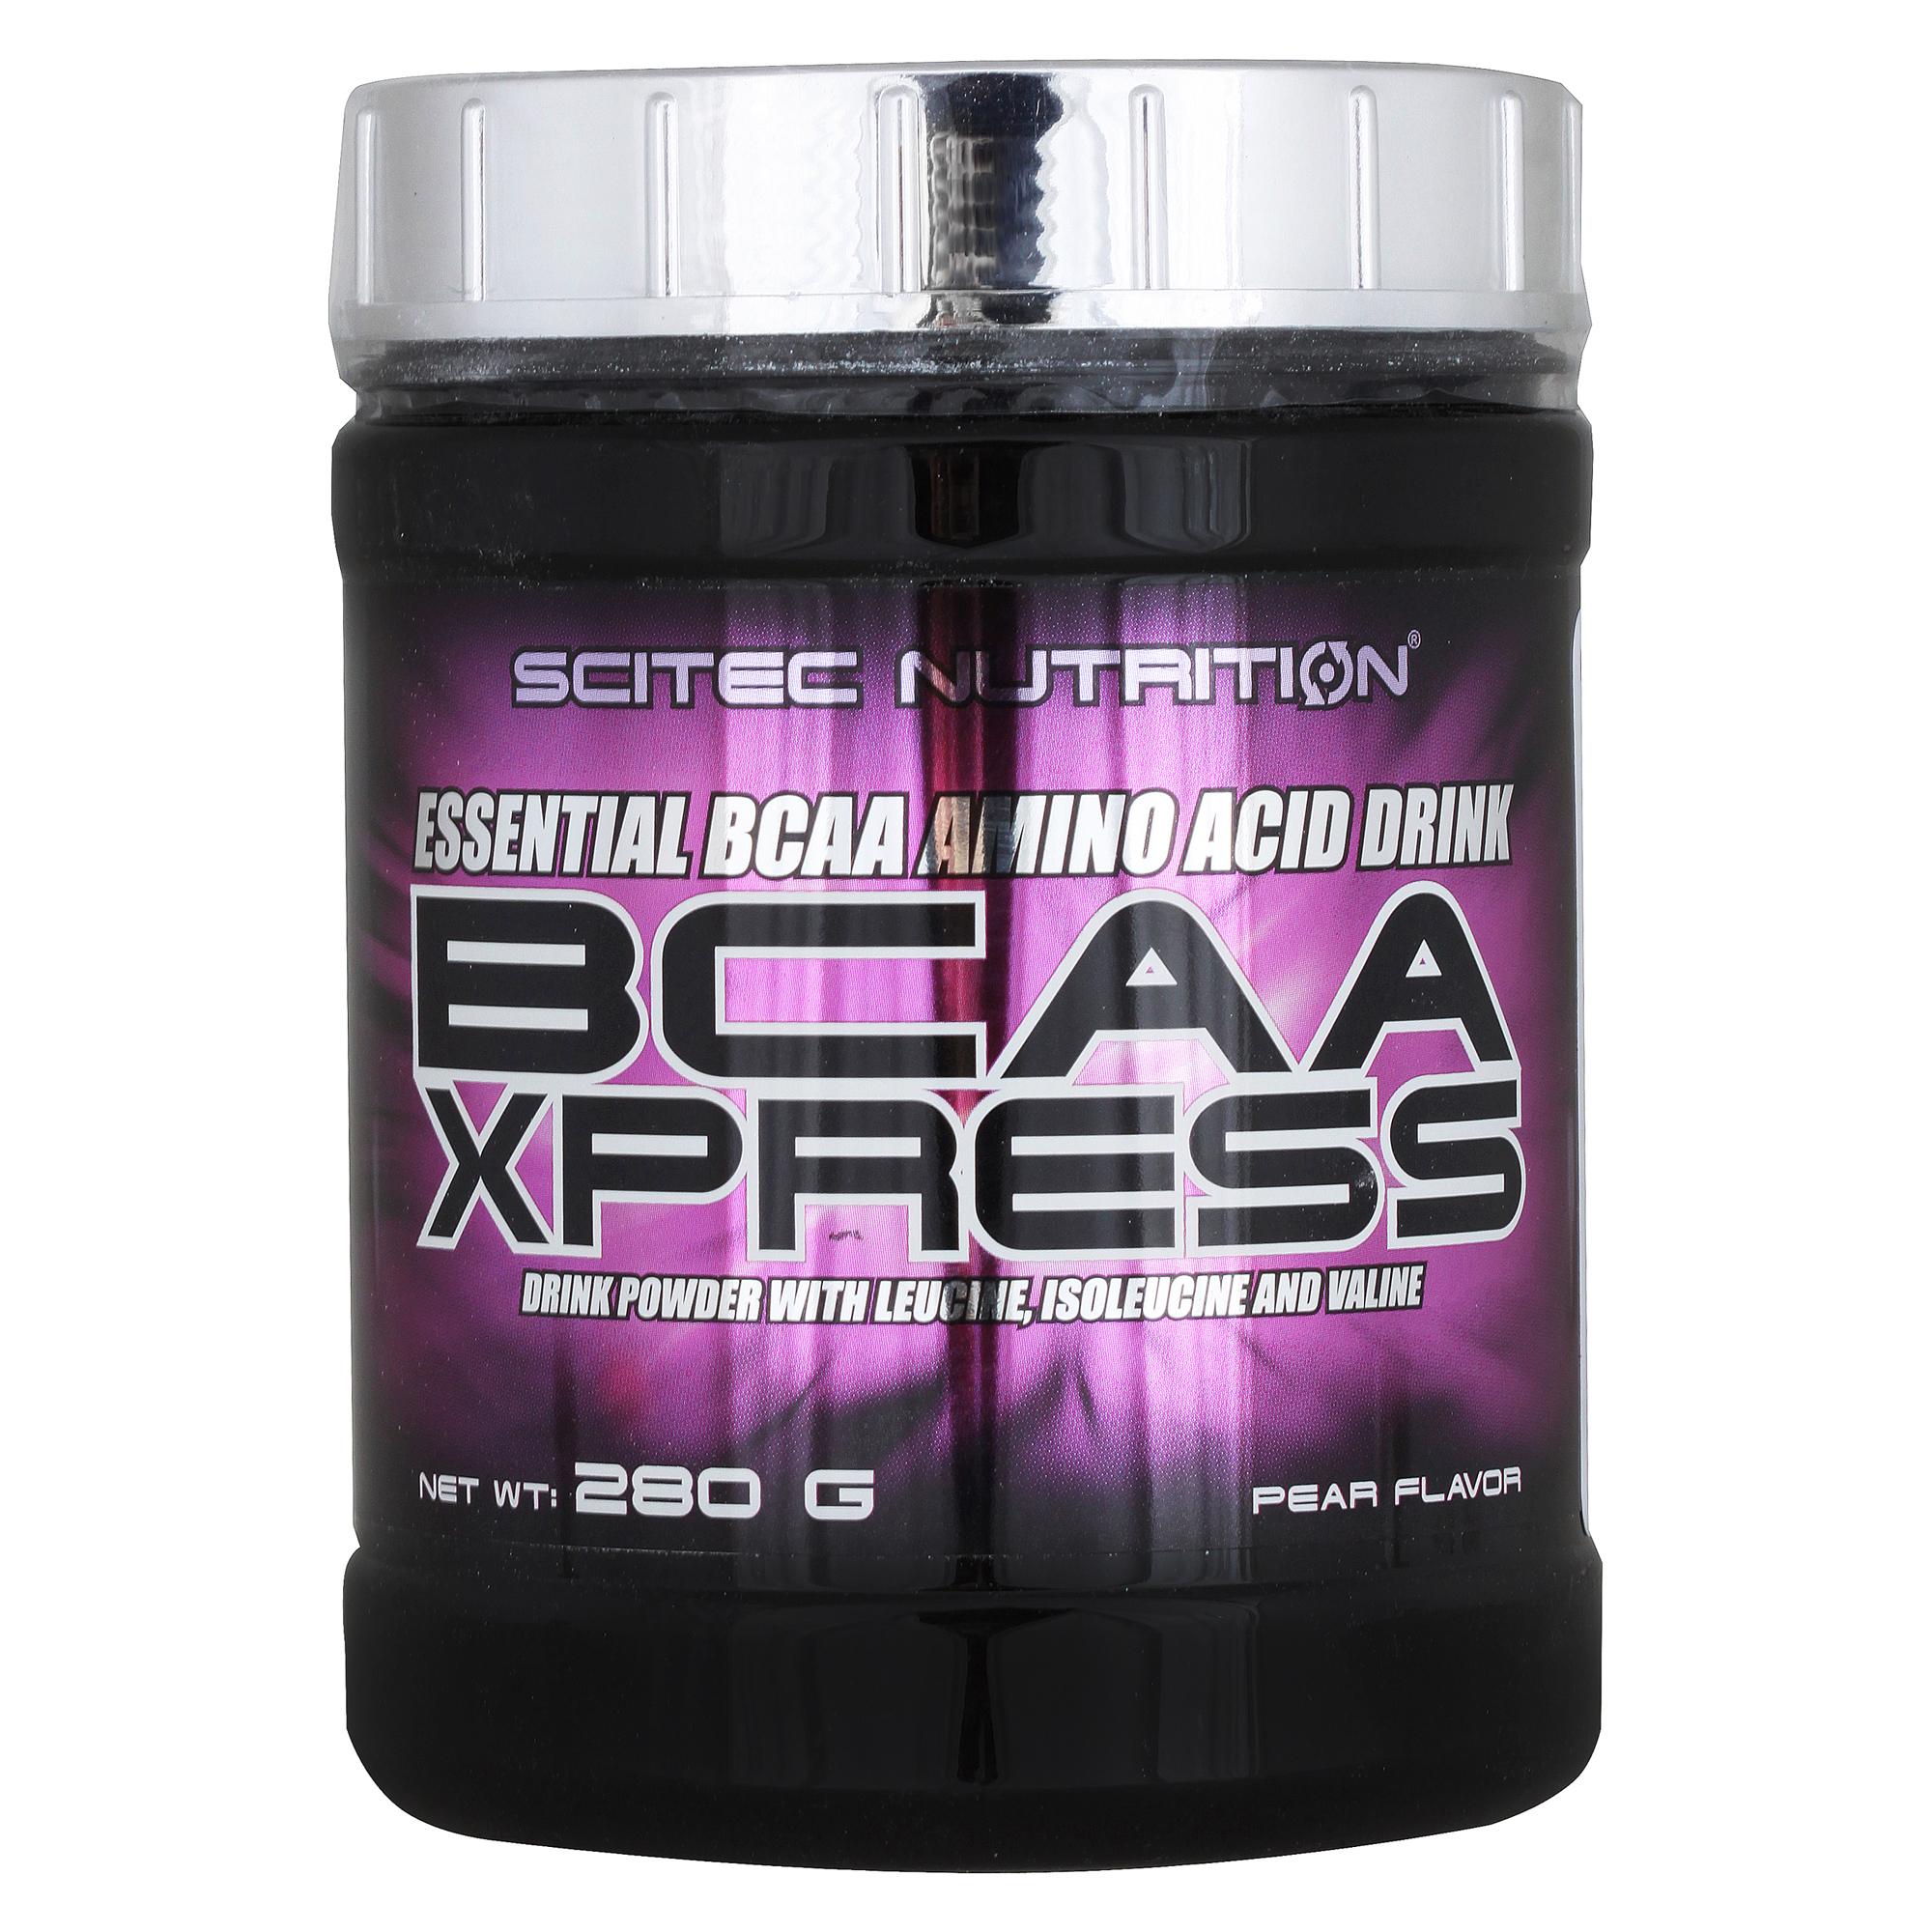 Scitec Nutrition Аминокислоты BCAA Xpress, 280 г, вкус: груша